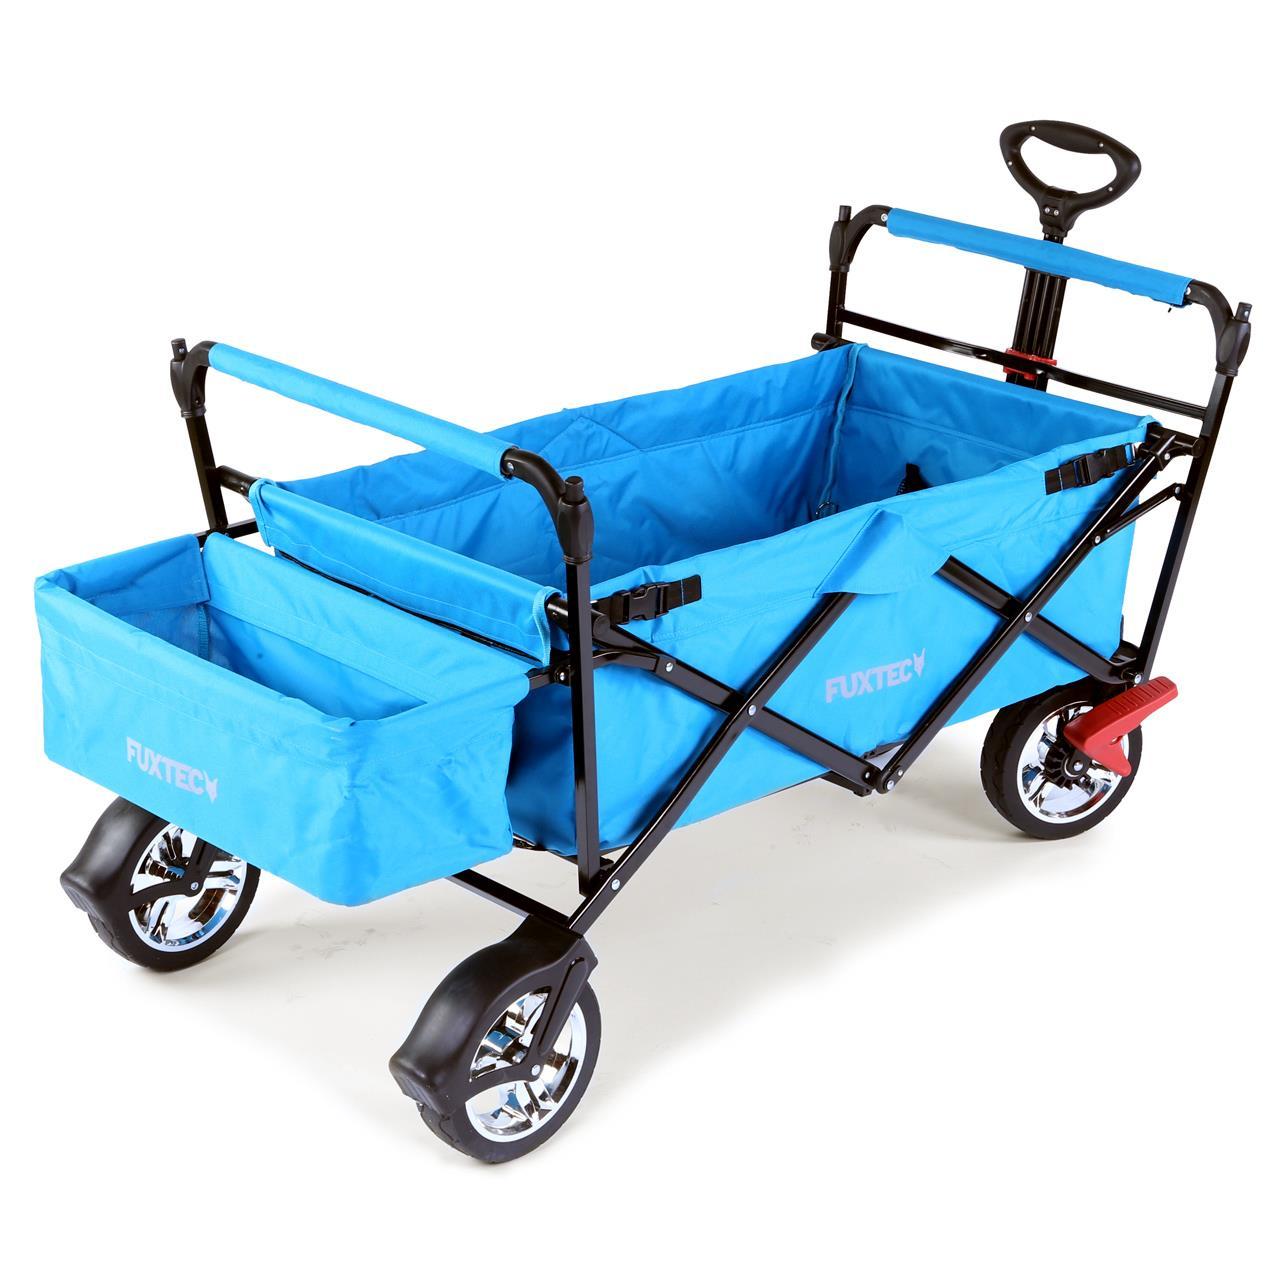 fuxtec bollerwagen ct 500atb t rkis mit dach faltbar bollerwagen faltbar bollerwagen. Black Bedroom Furniture Sets. Home Design Ideas